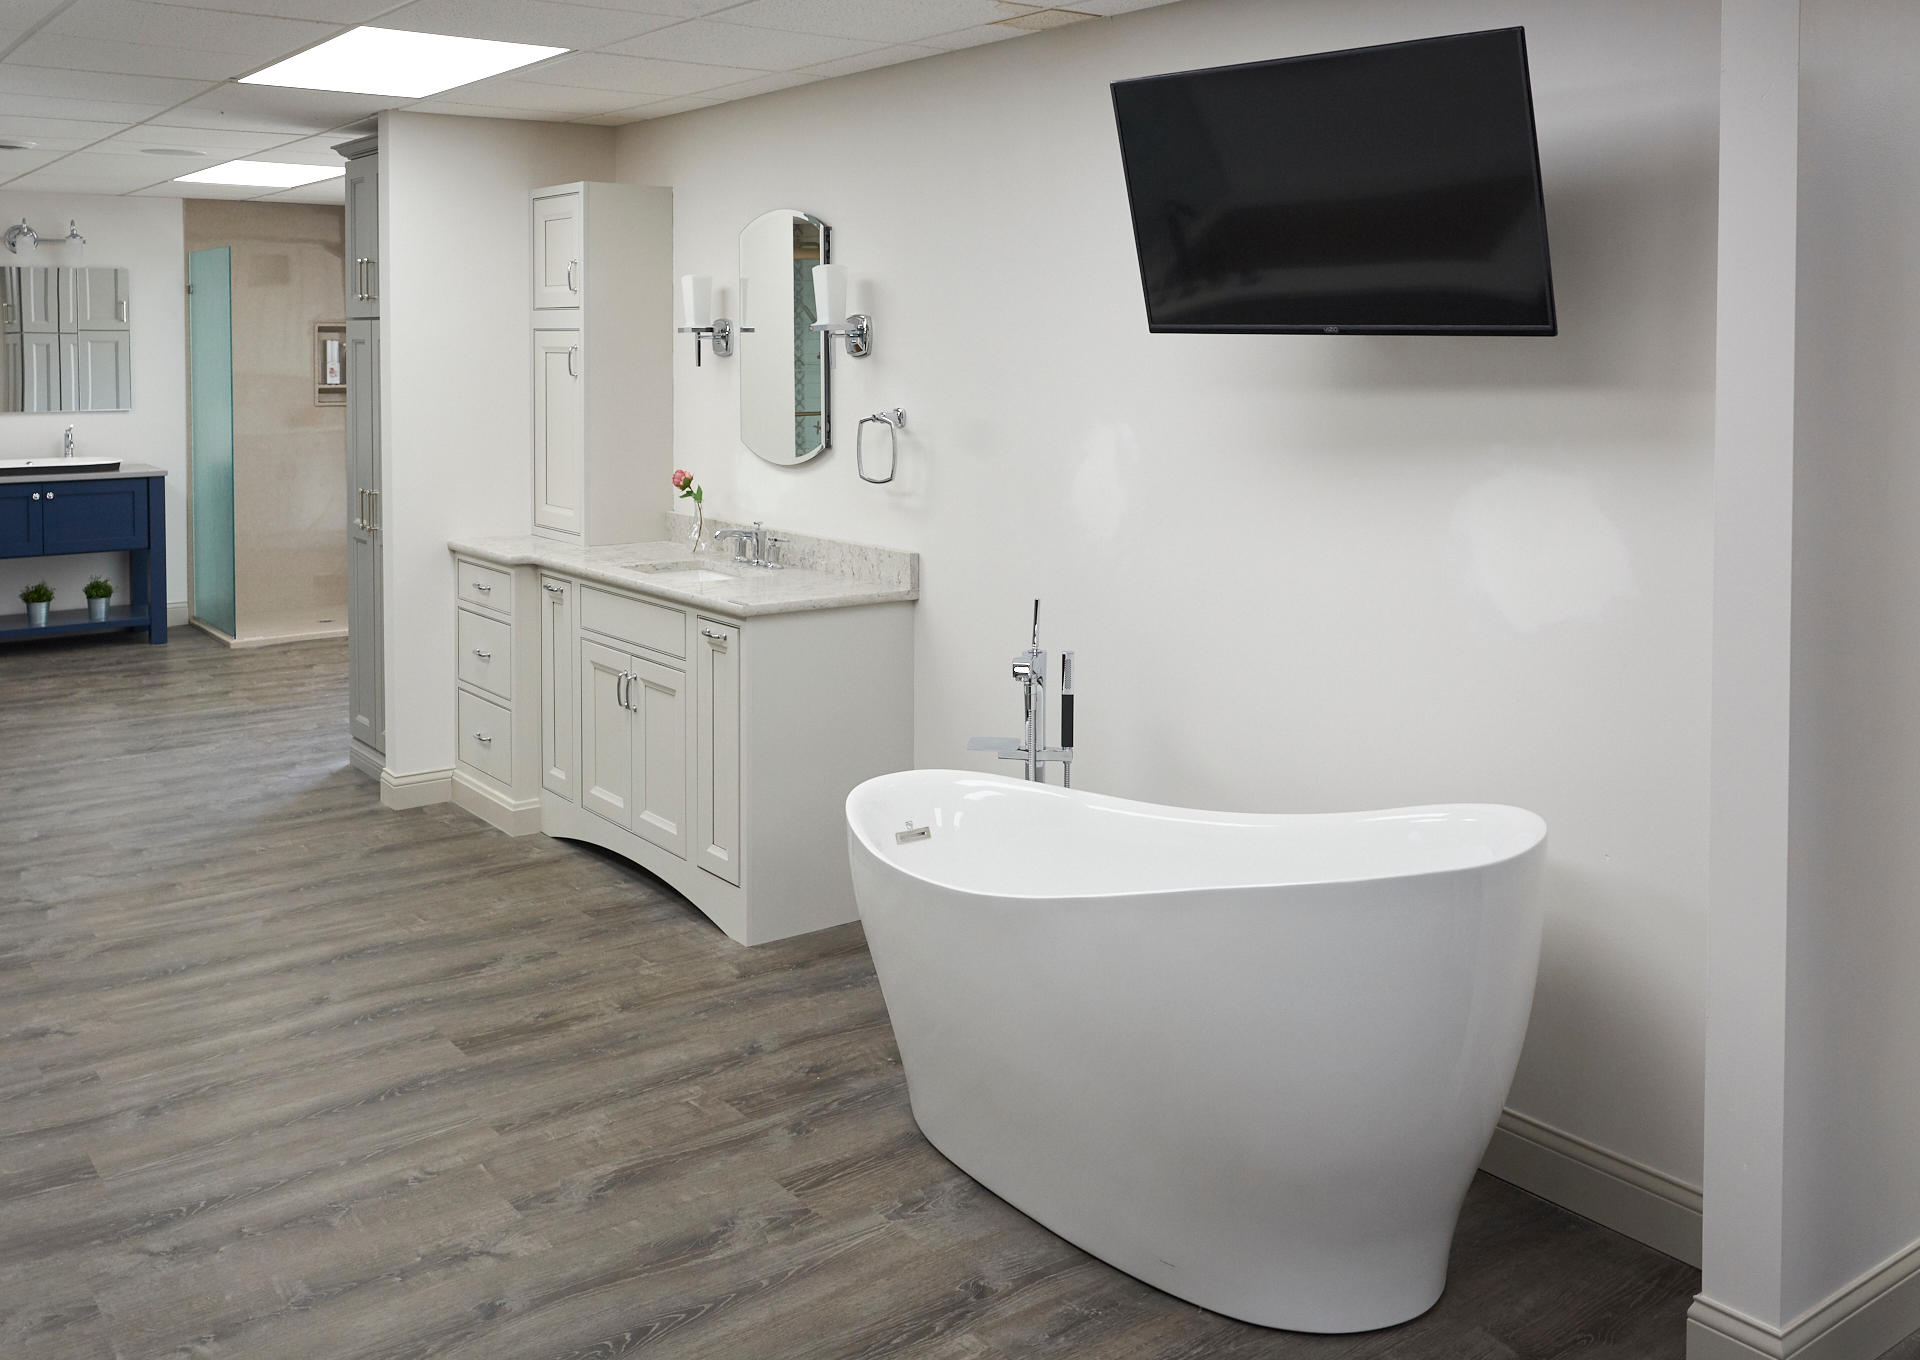 Milford Kitchen and Bath